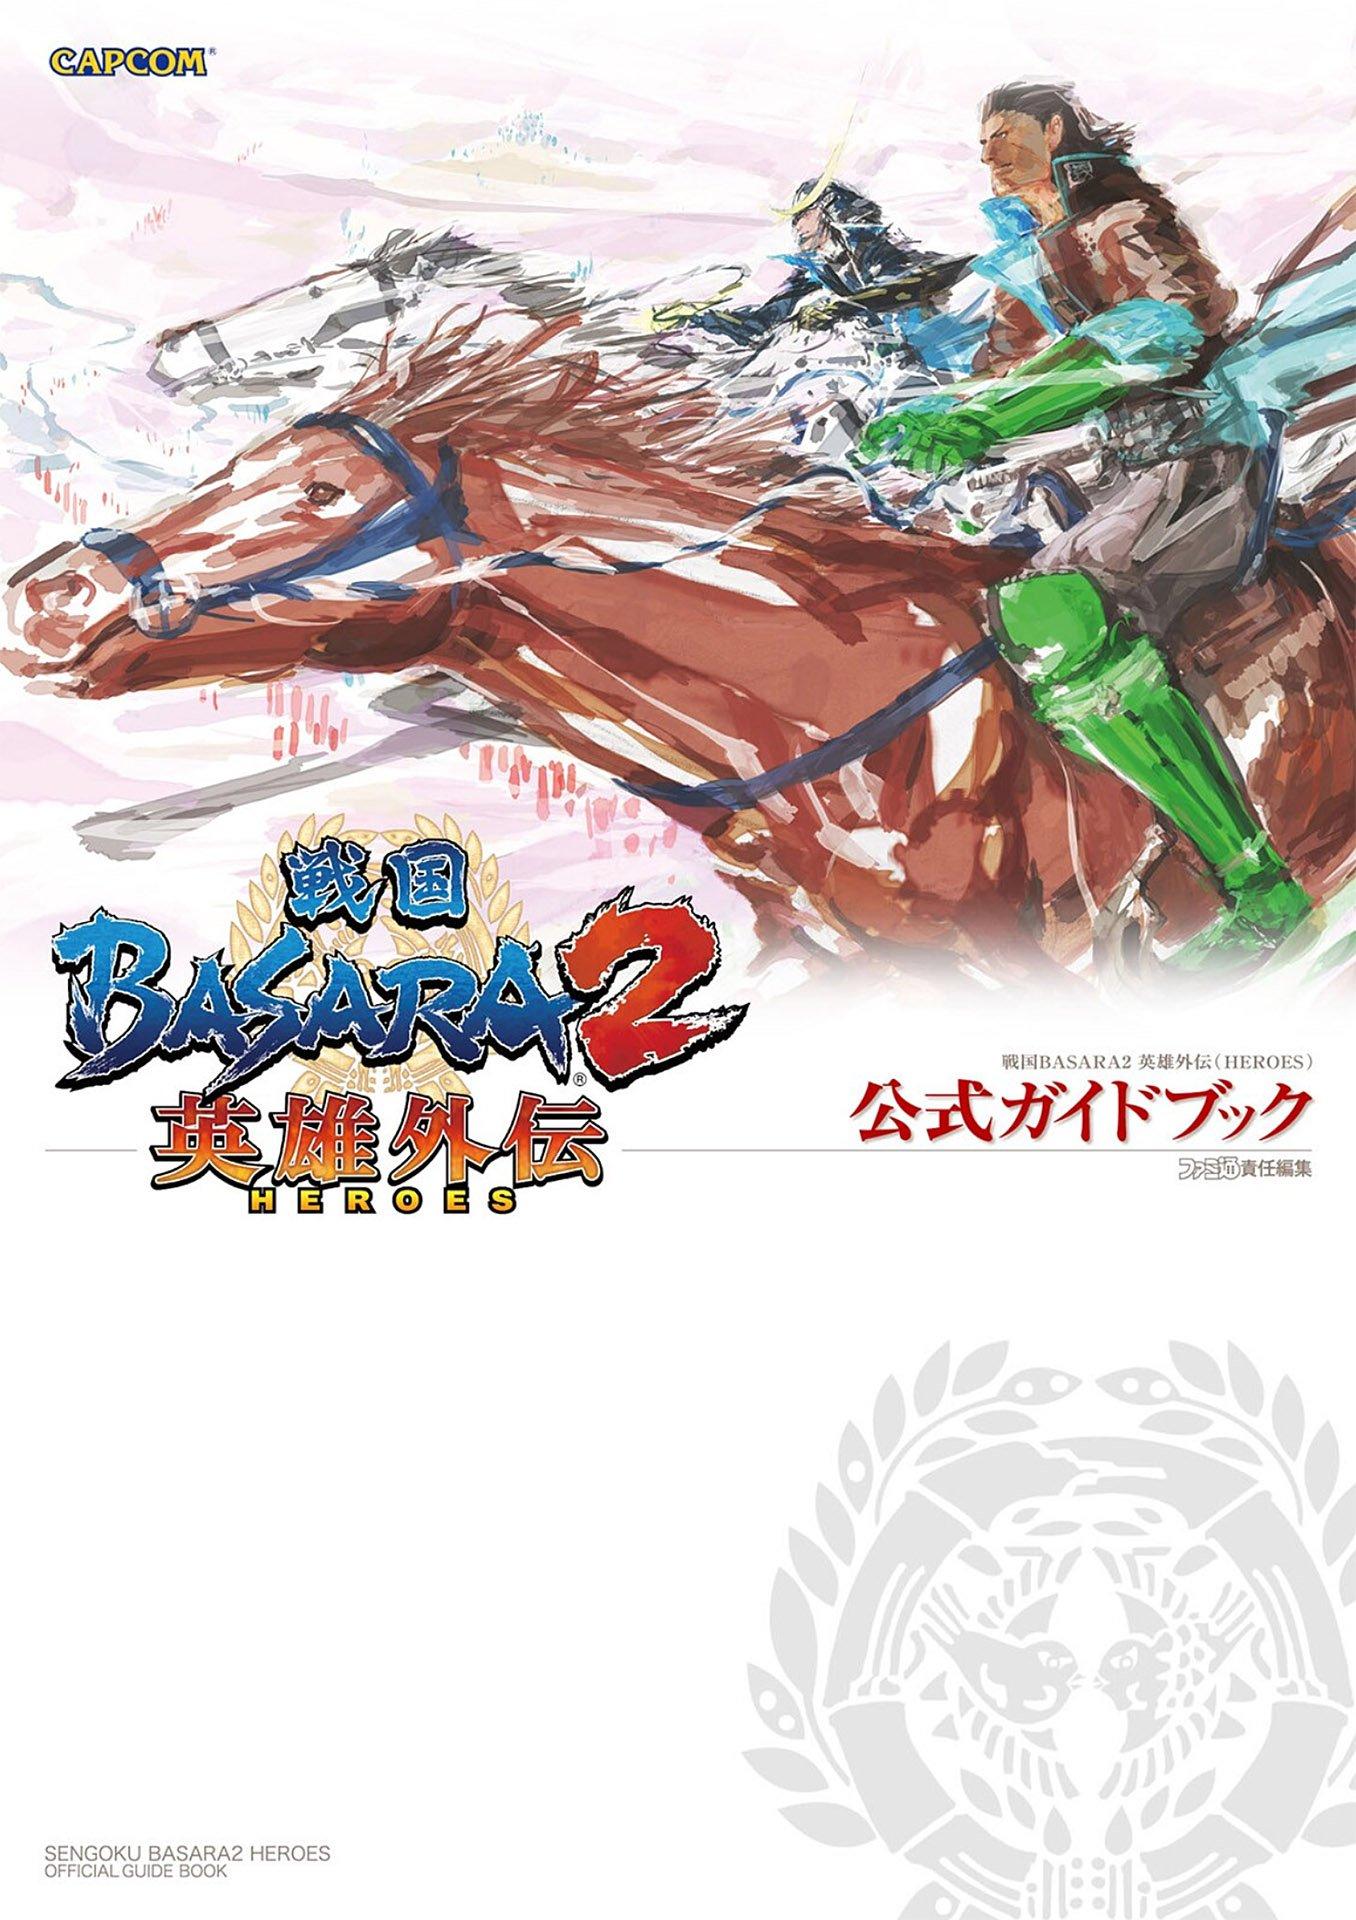 Sengoku Basara 2: Heroes - Official Guide Book (Famitsu)